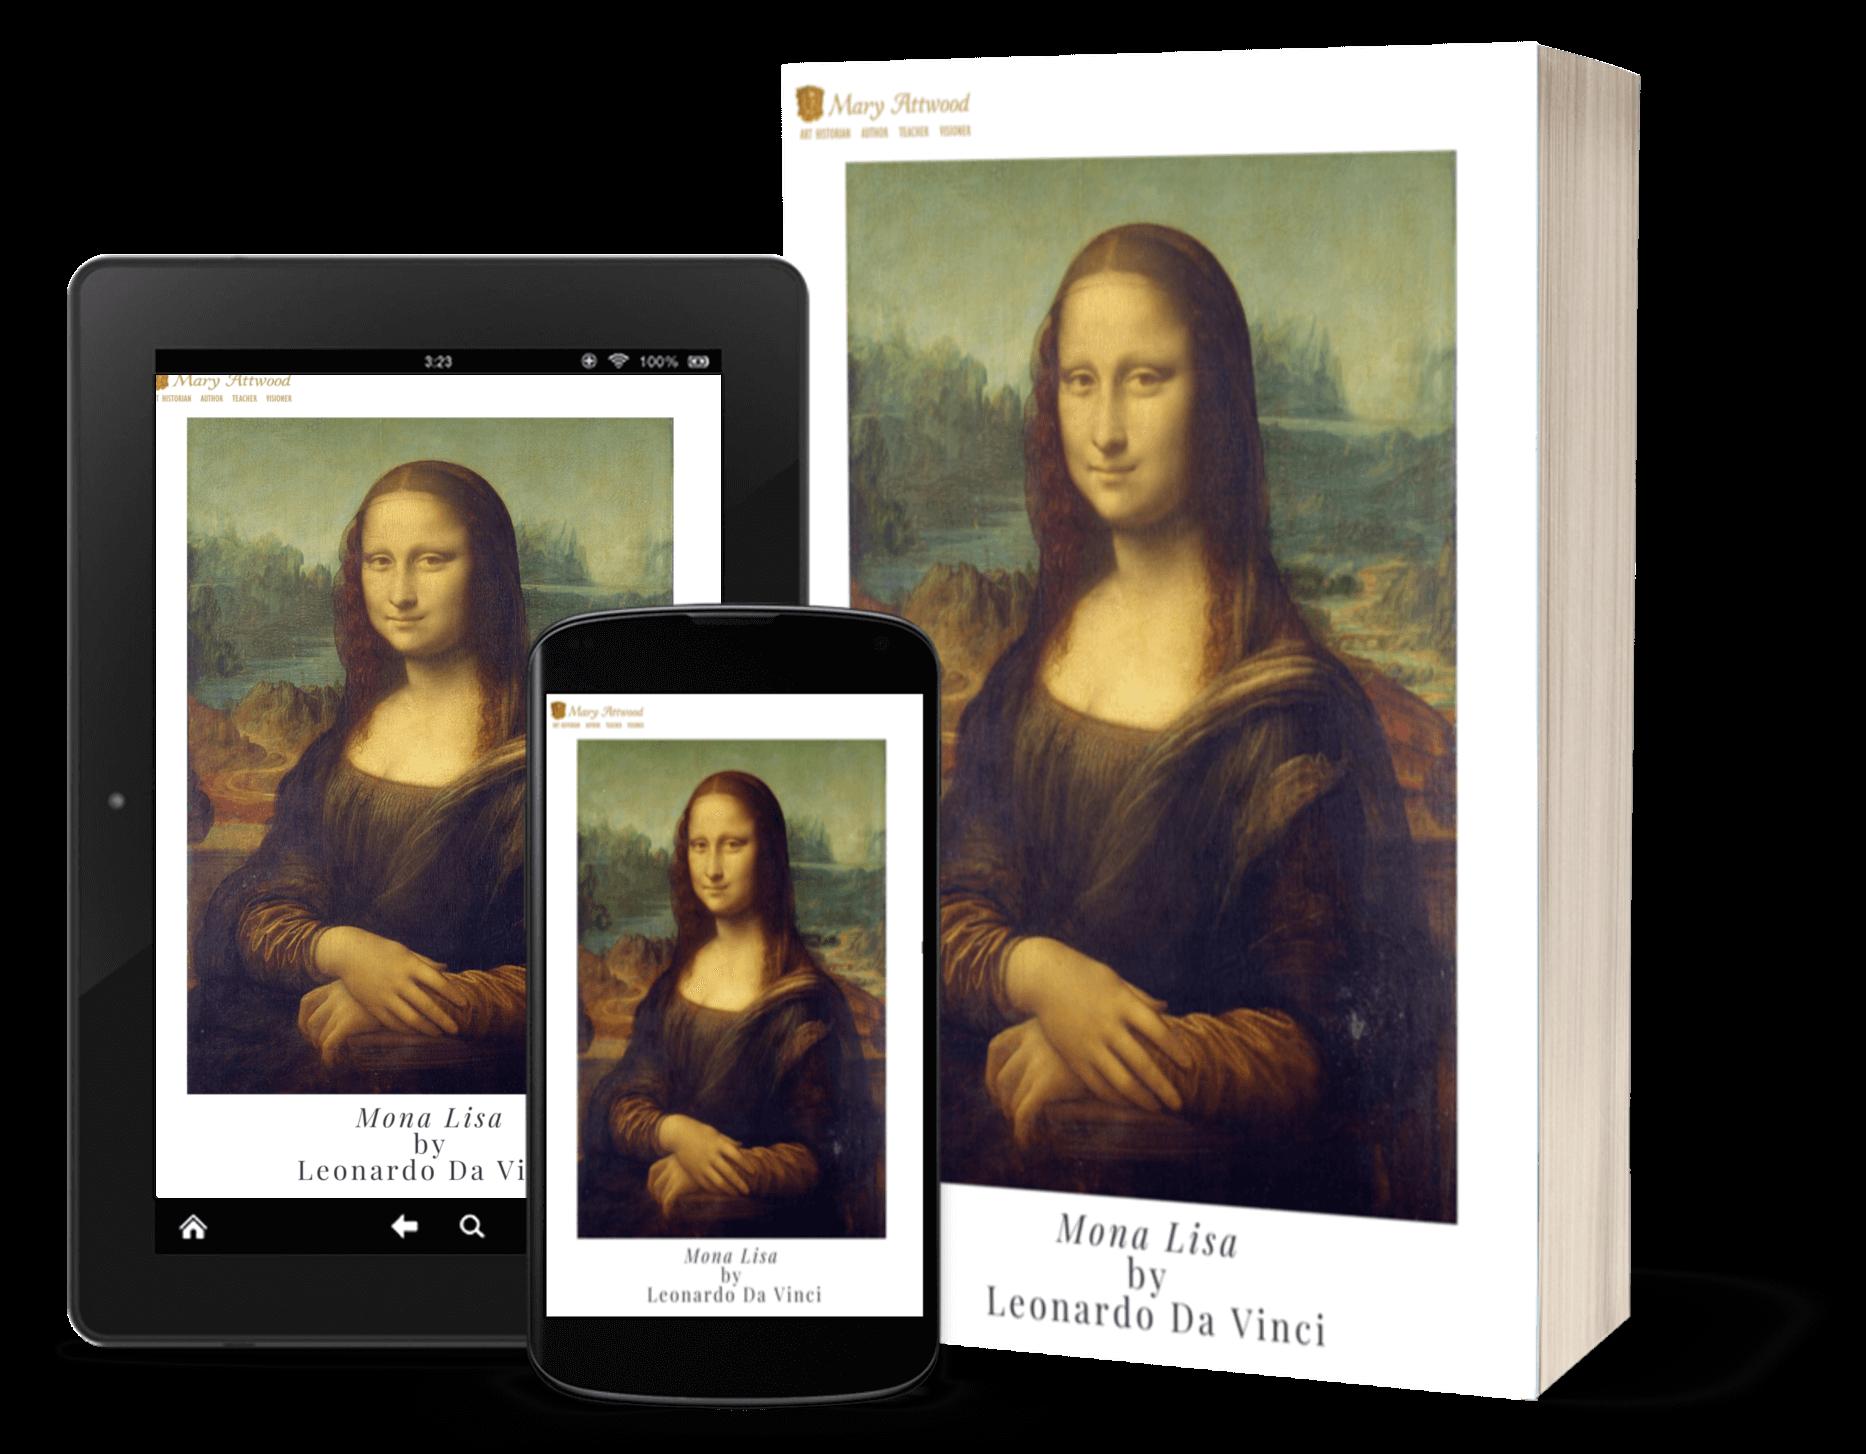 Mona Lisa by Leonardo Da Vinci gift